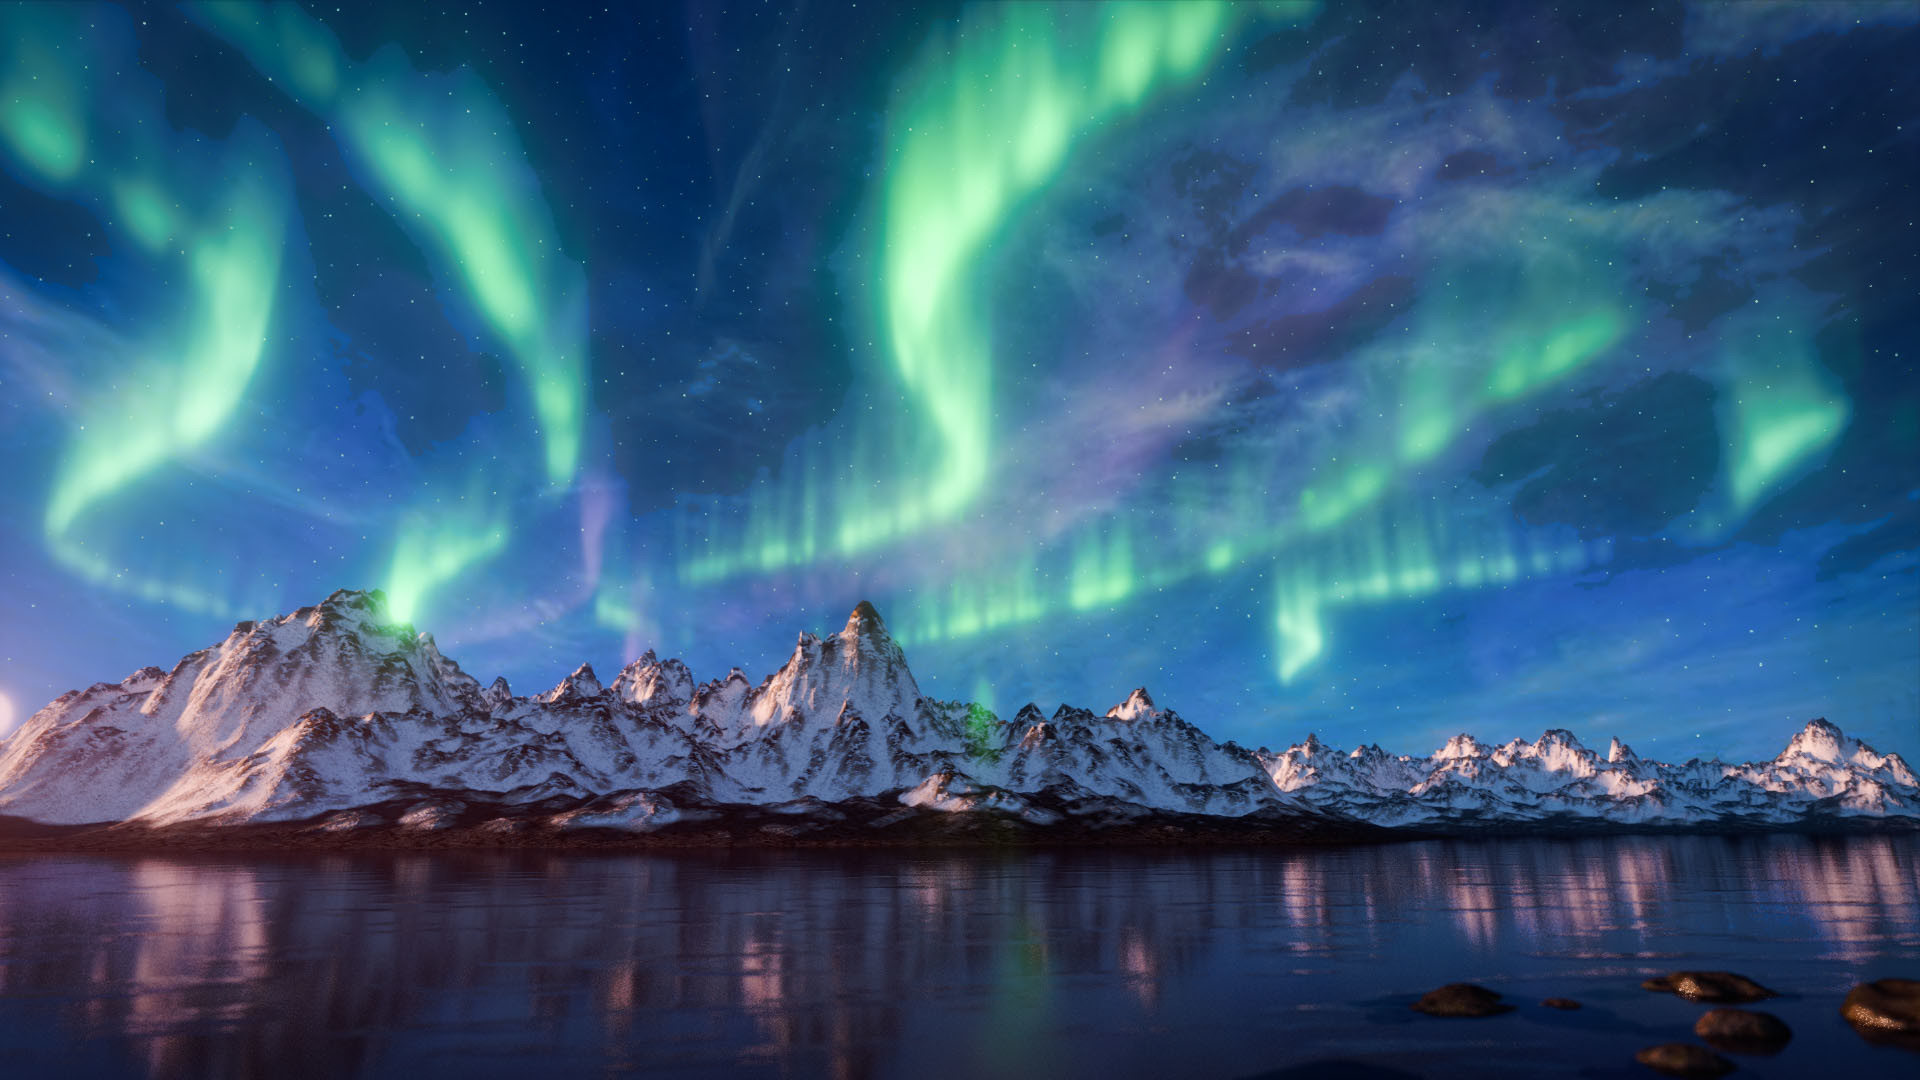 ArtStation - The Aurora Borealis, Steve Lund